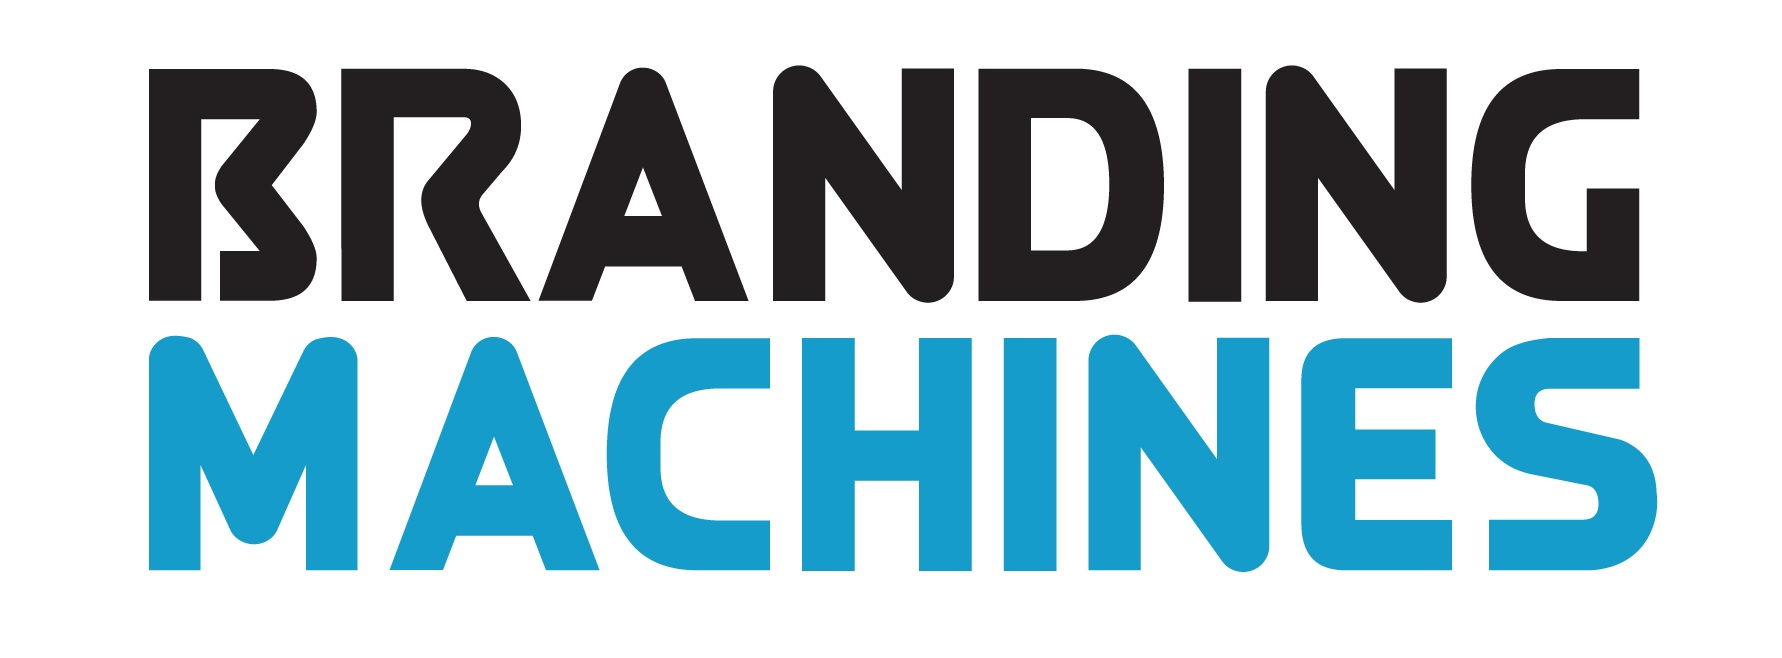 Branding-Machines-Logo-Final-File.jpg